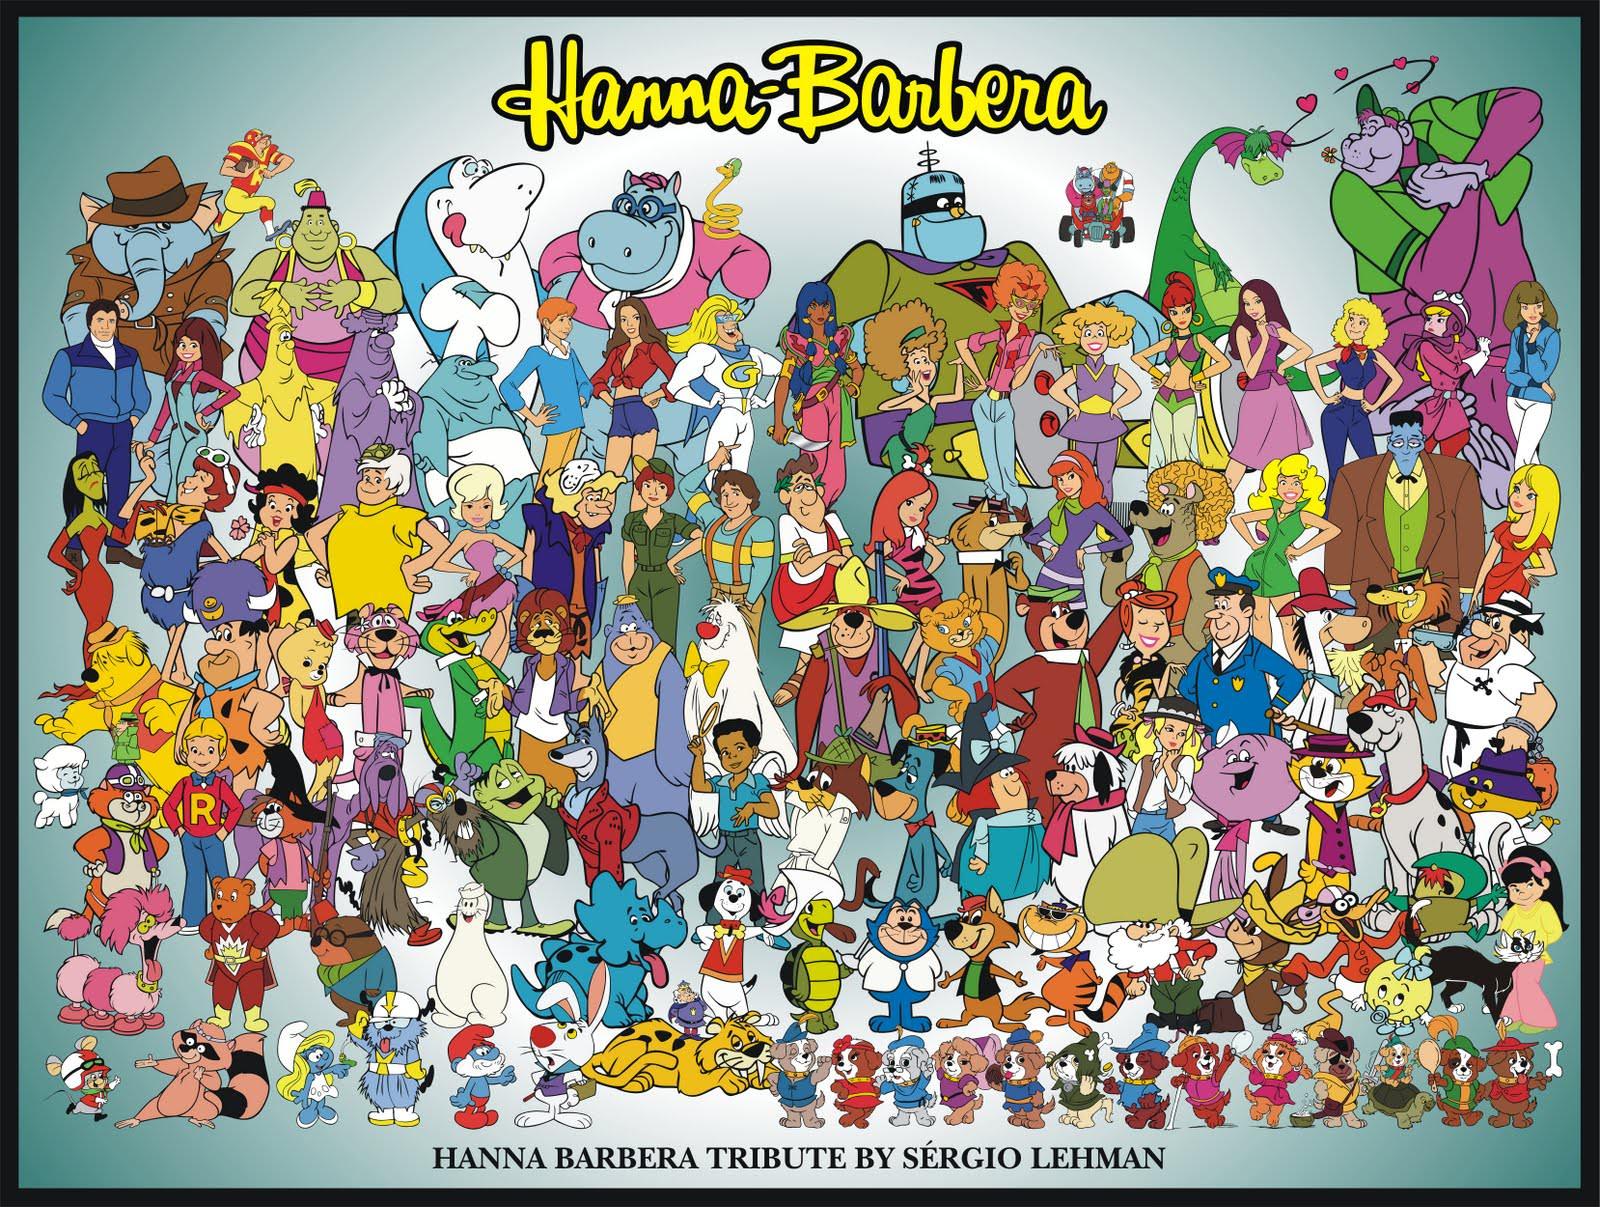 Tributo a Hanna-Barbera